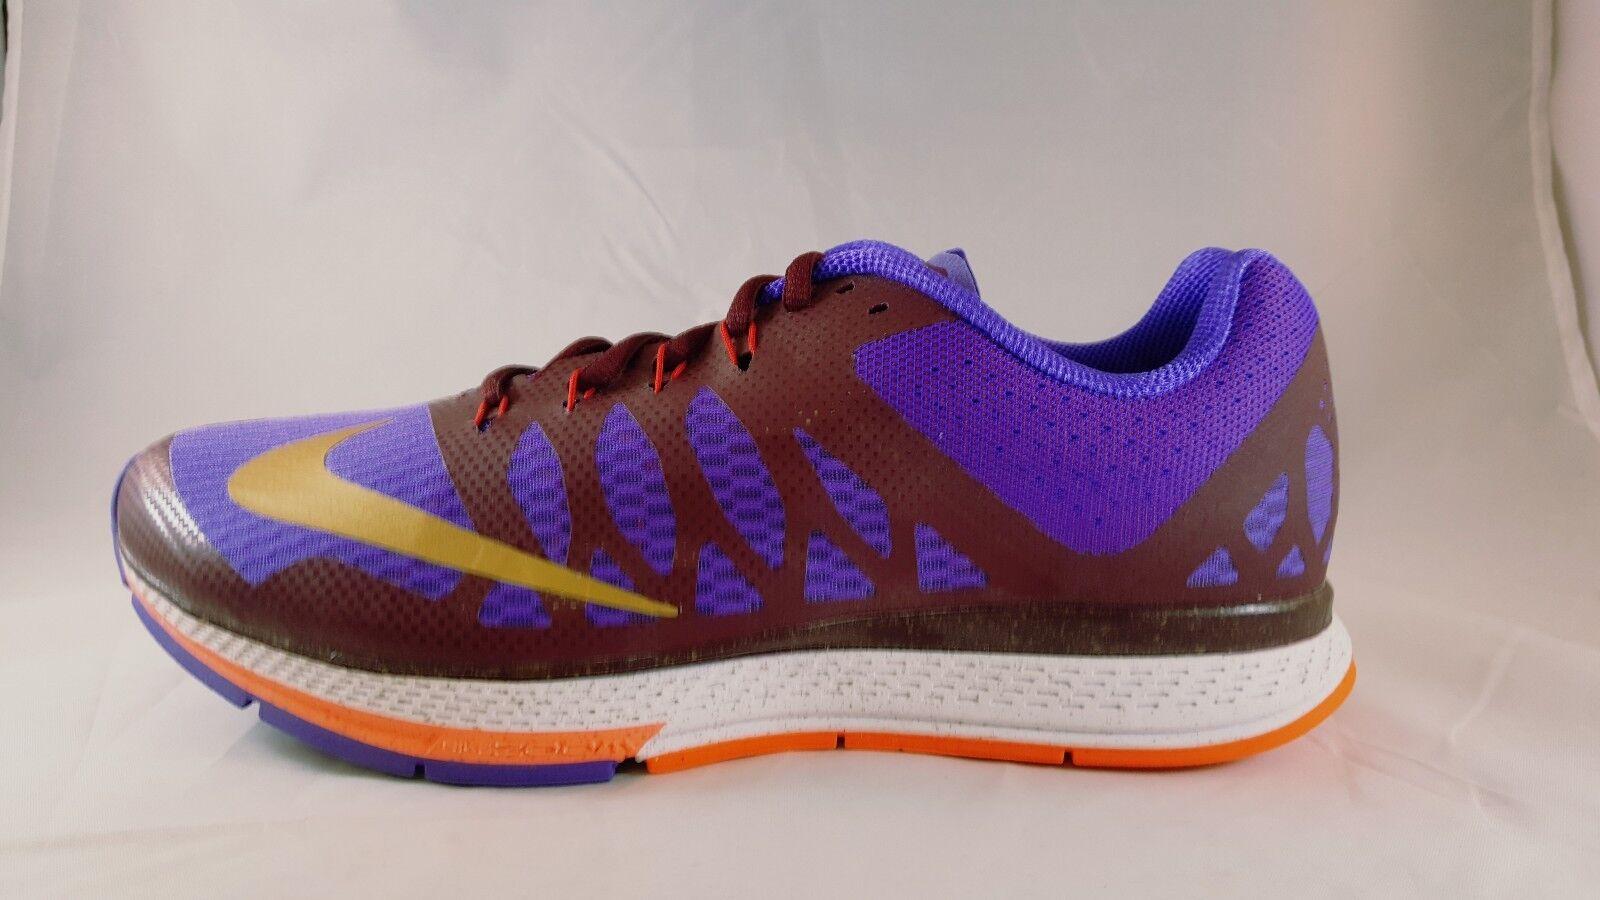 Nike Zoom Elite Elite Elite 7 QS Women's Running shoes 716435 685 Size 10 0ca823